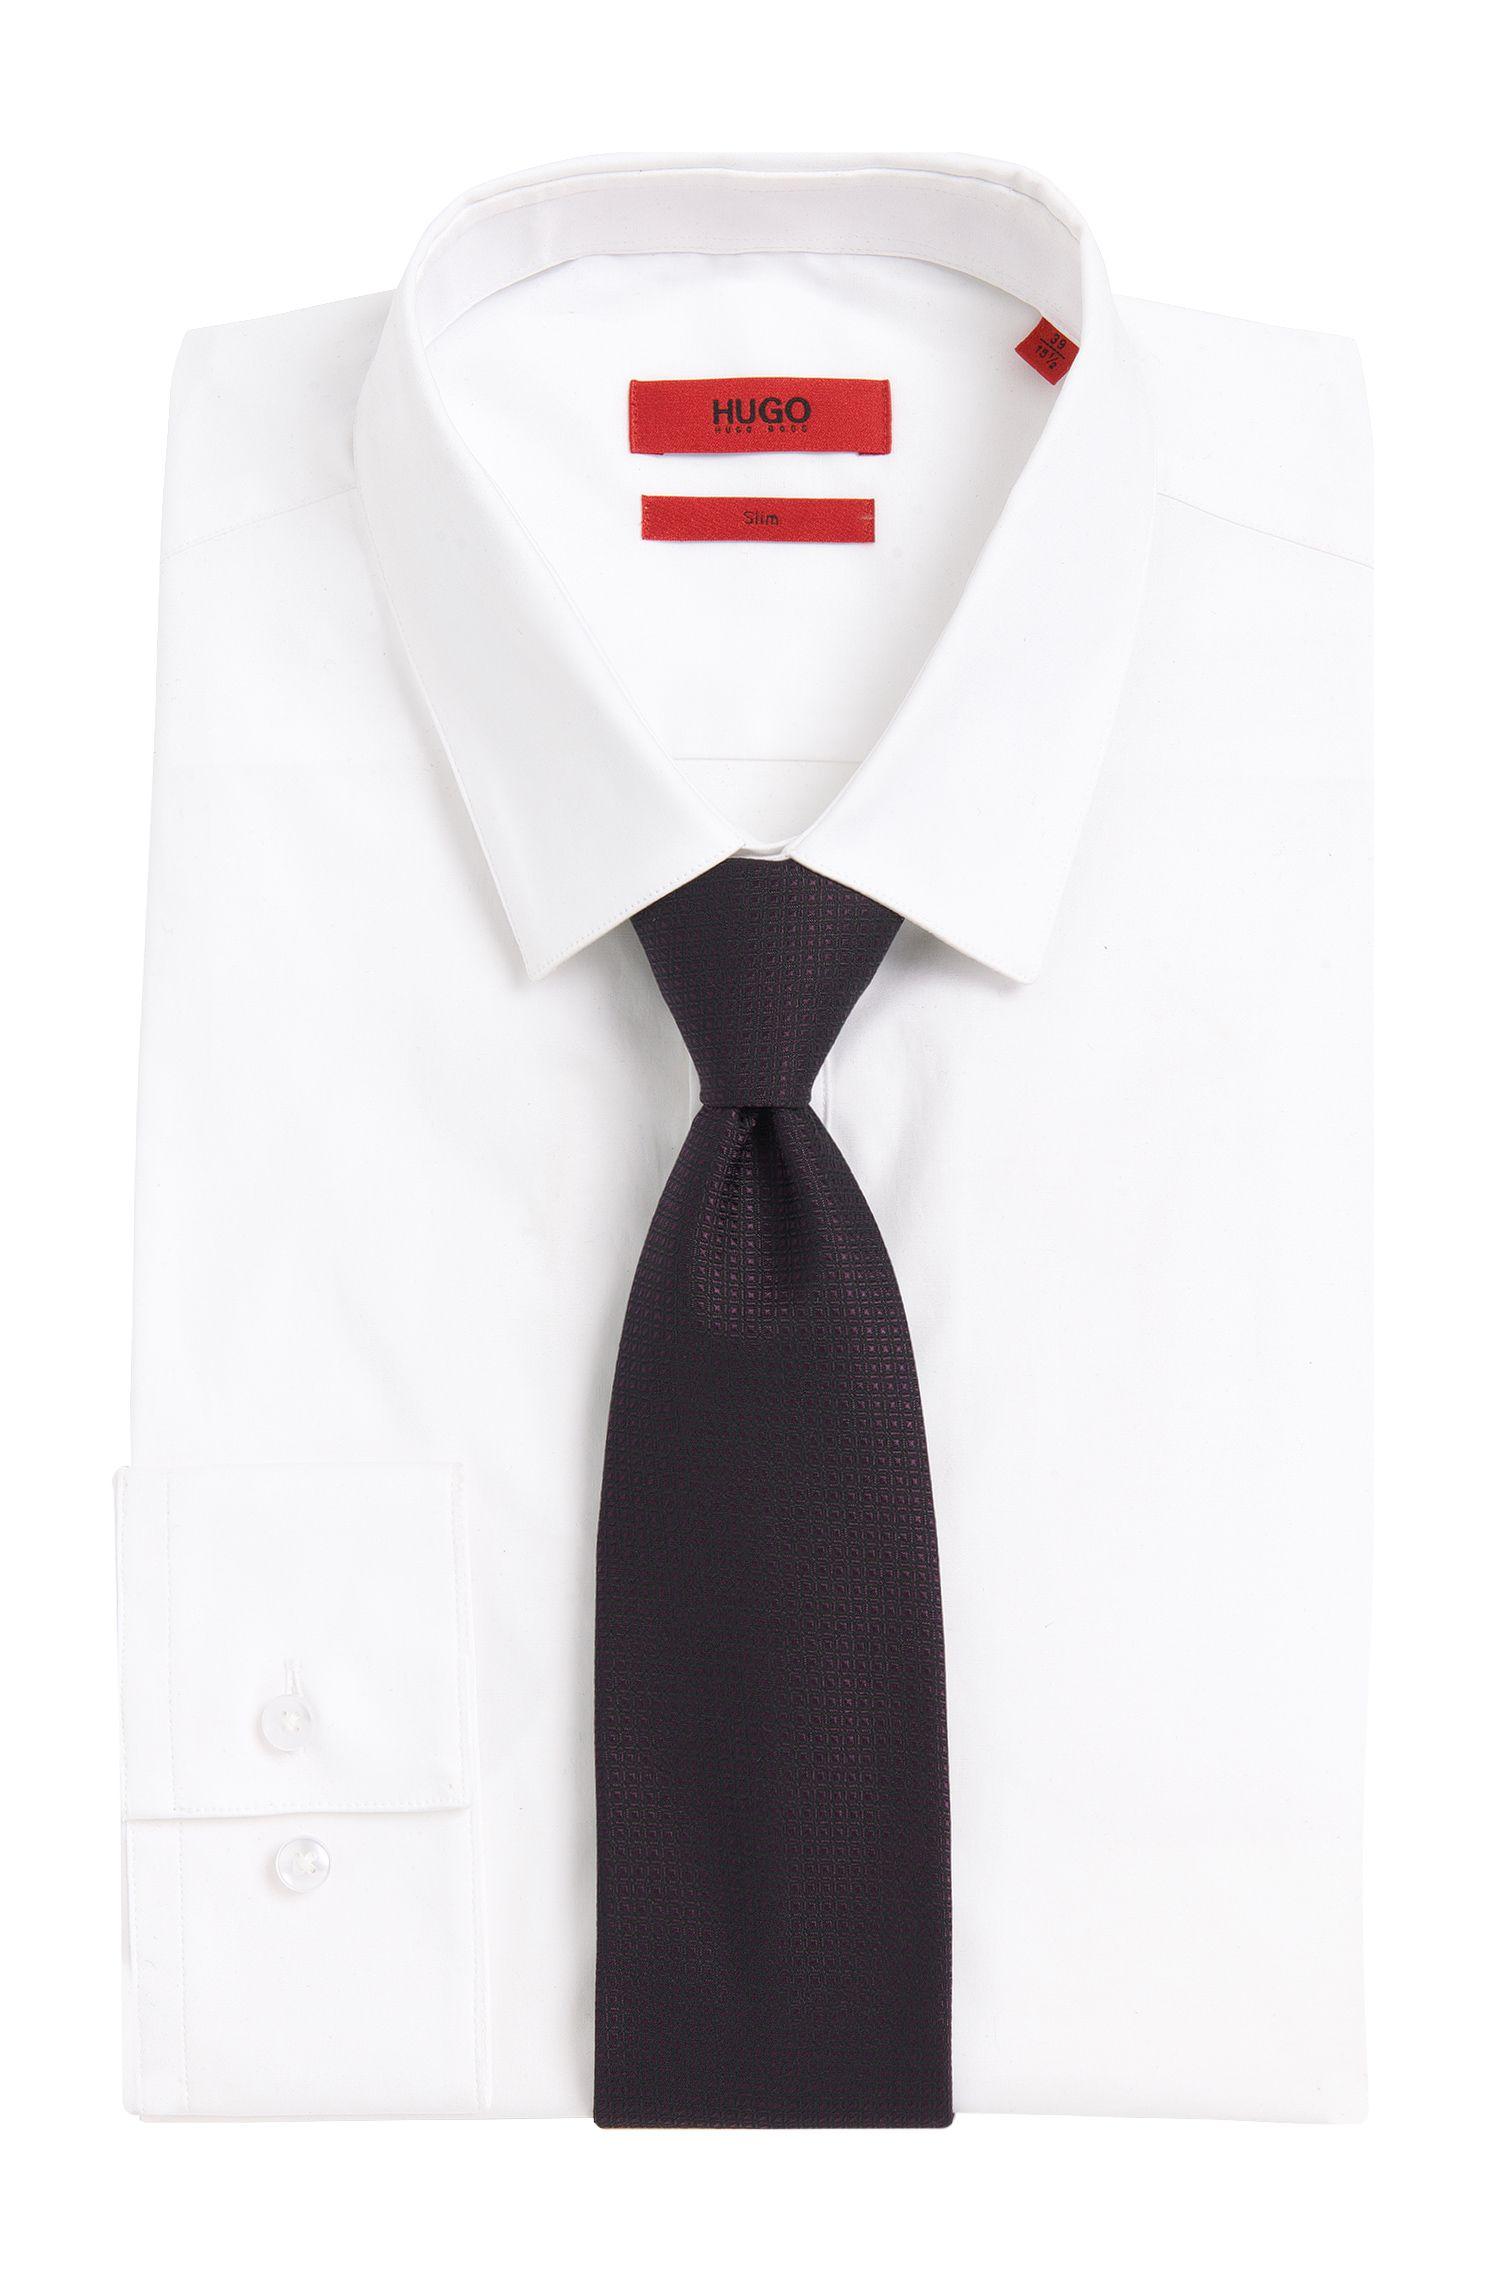 Unifarbene Krawatte mit eingewebtem Muster: 'Tie 7 cm'